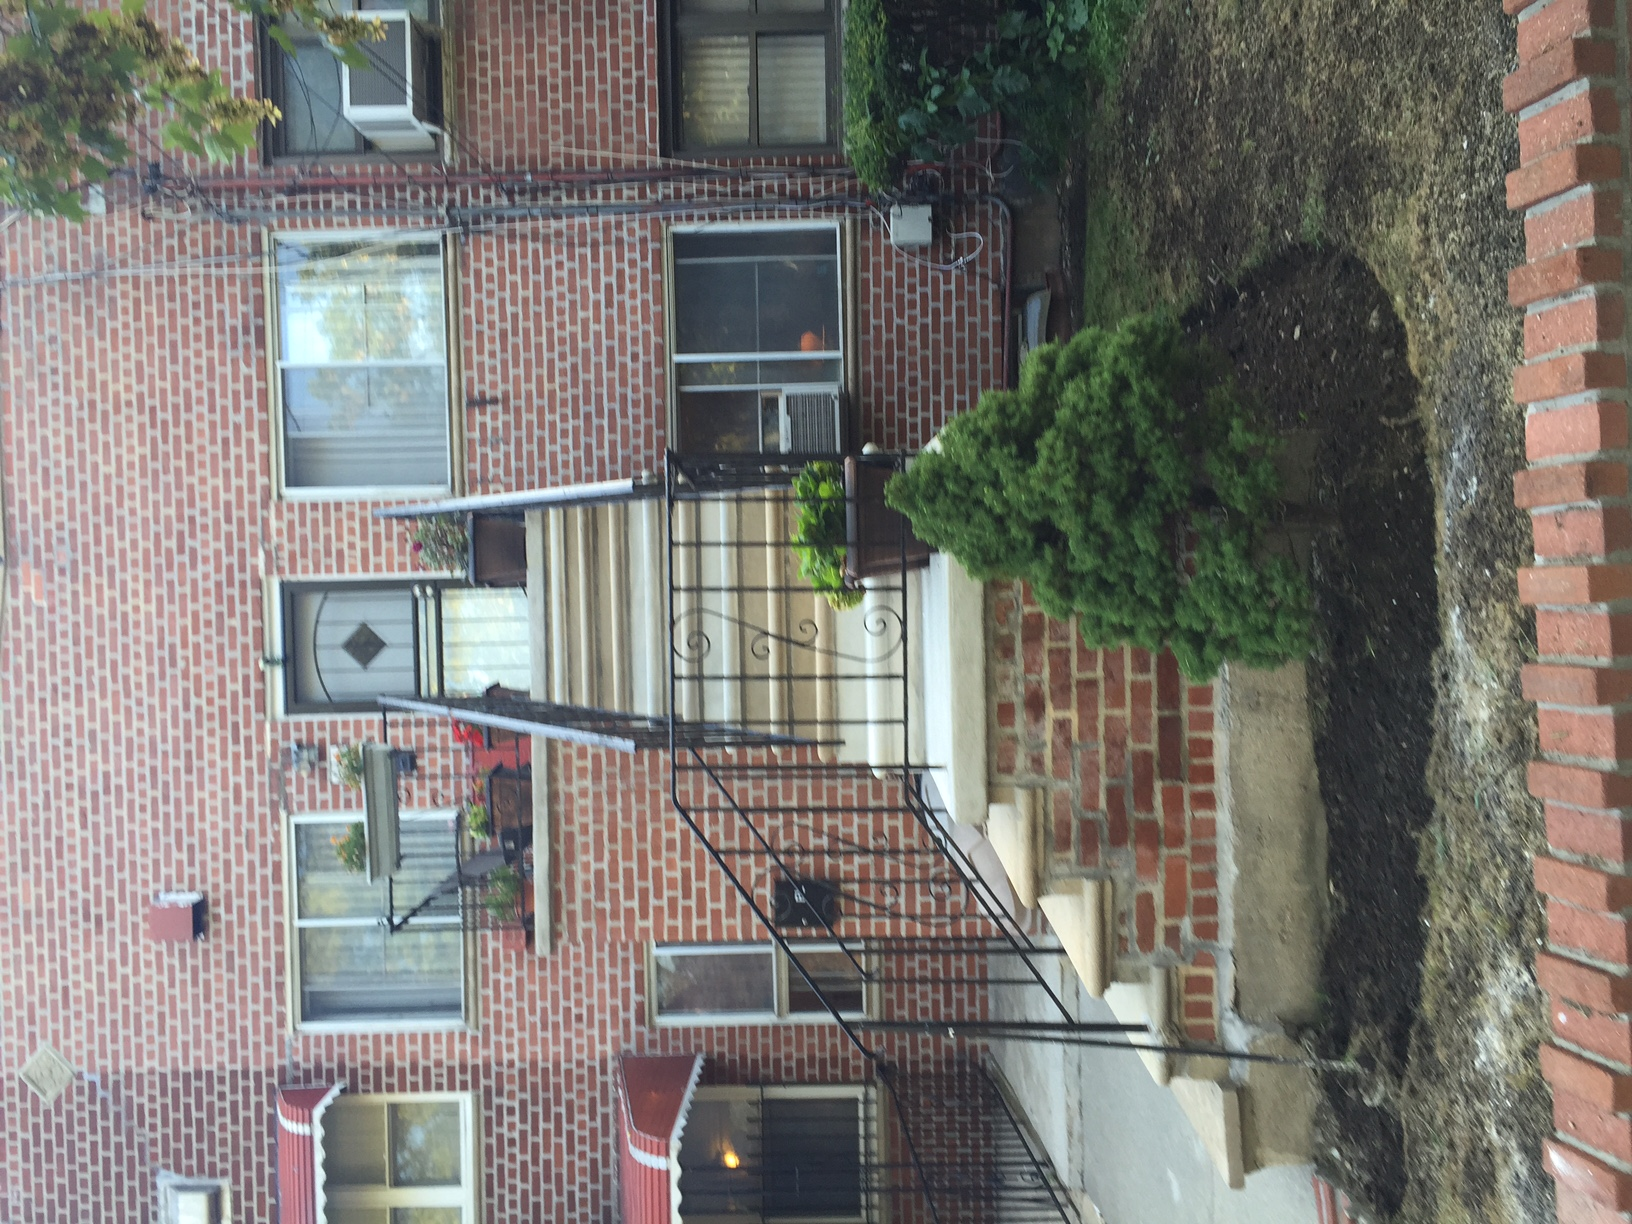 640 east 83rd, Brooklyn, New York 11236